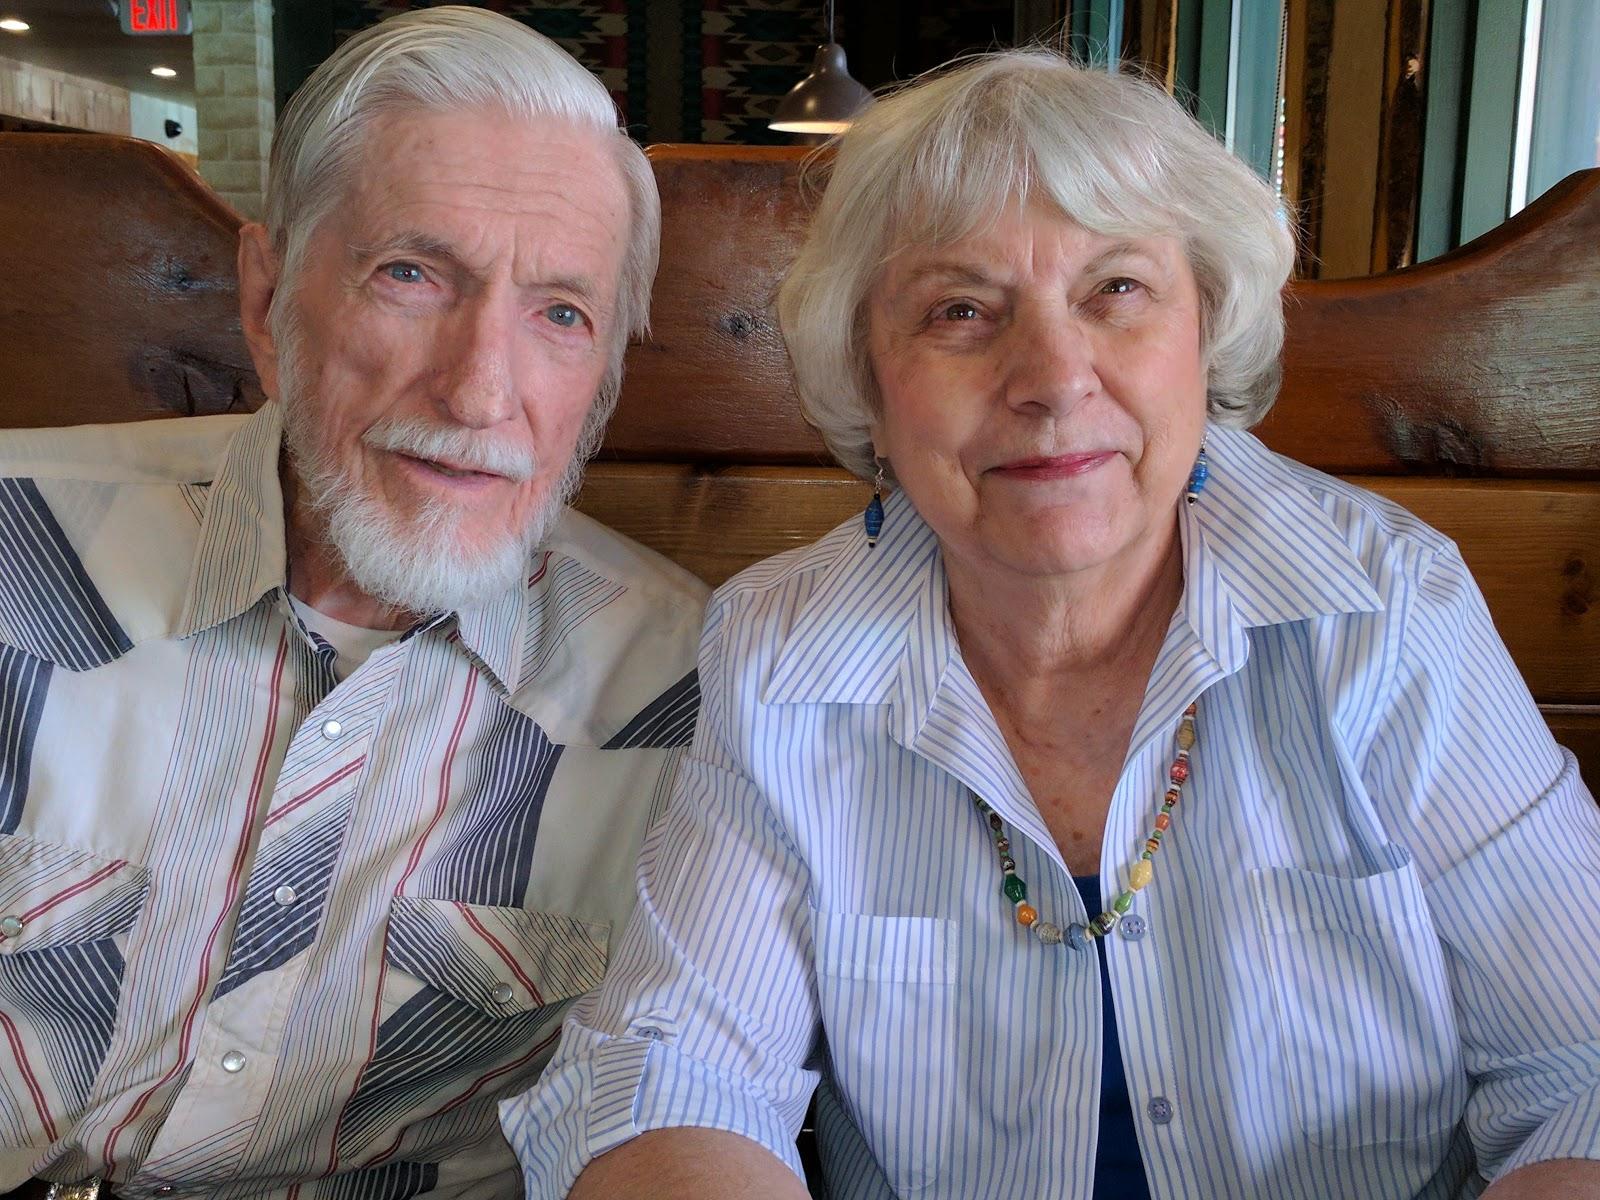 Frank and Sandy Slater